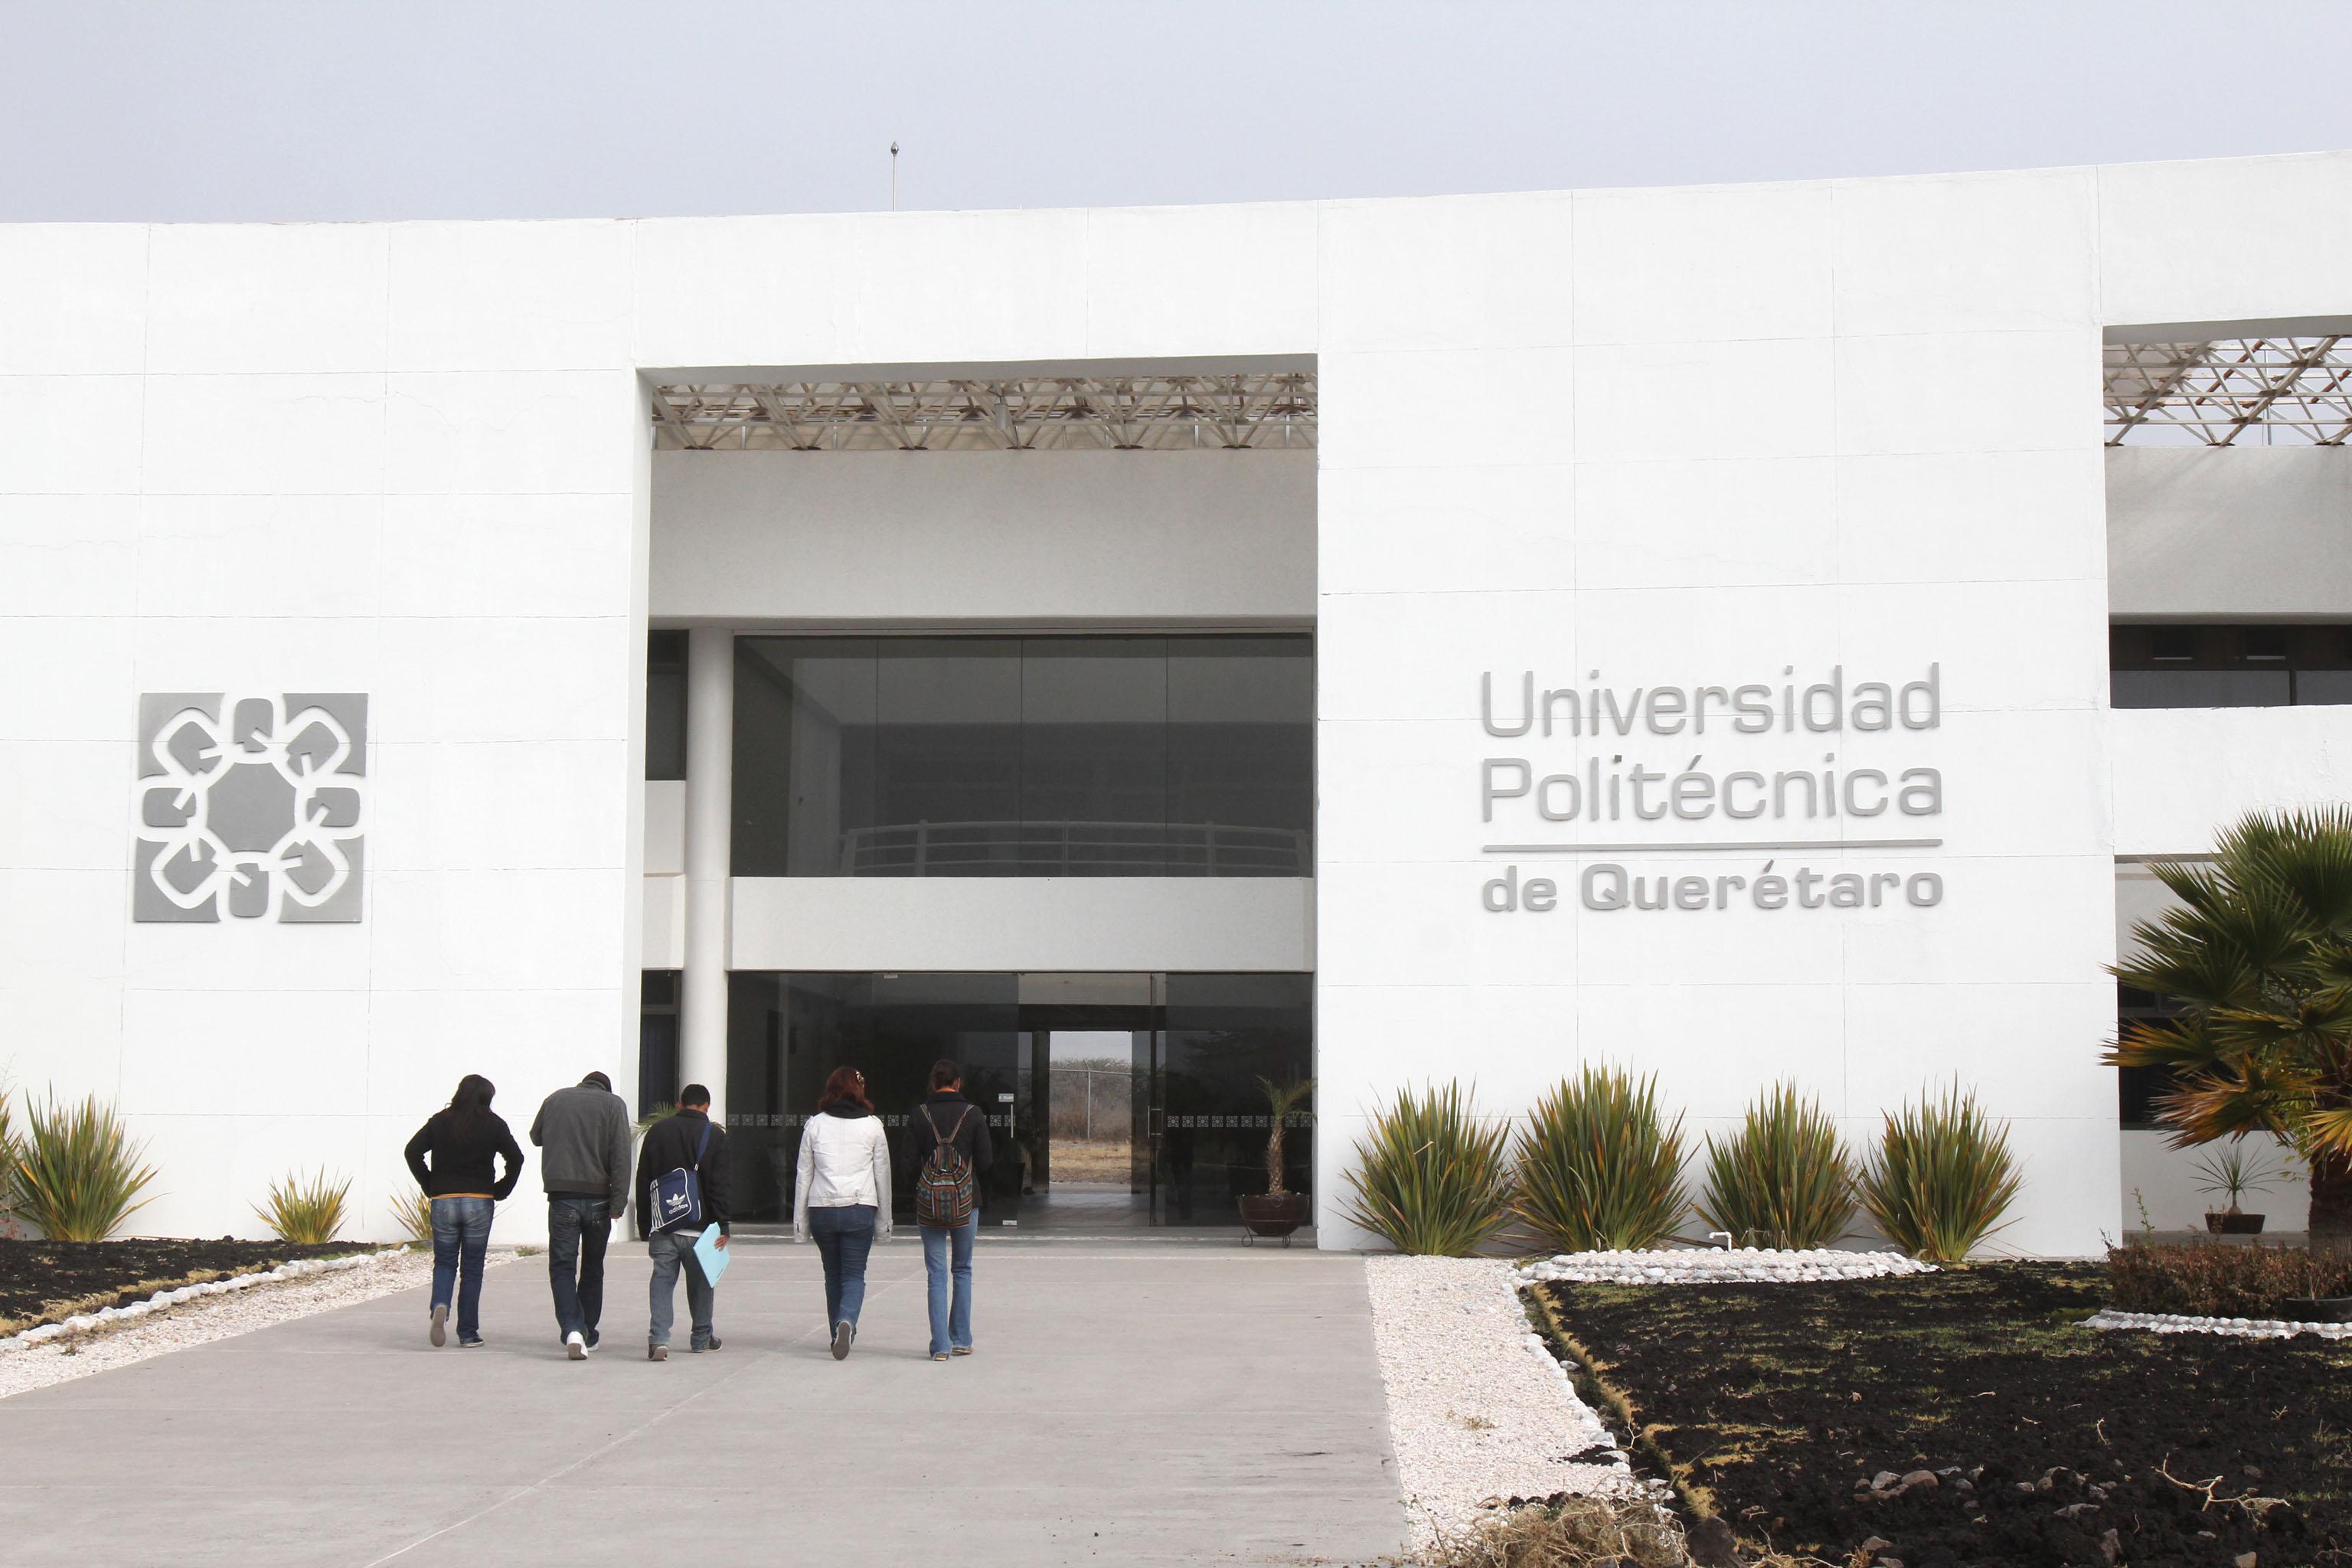 Solo 8 % de estudiantes llega a la universidad